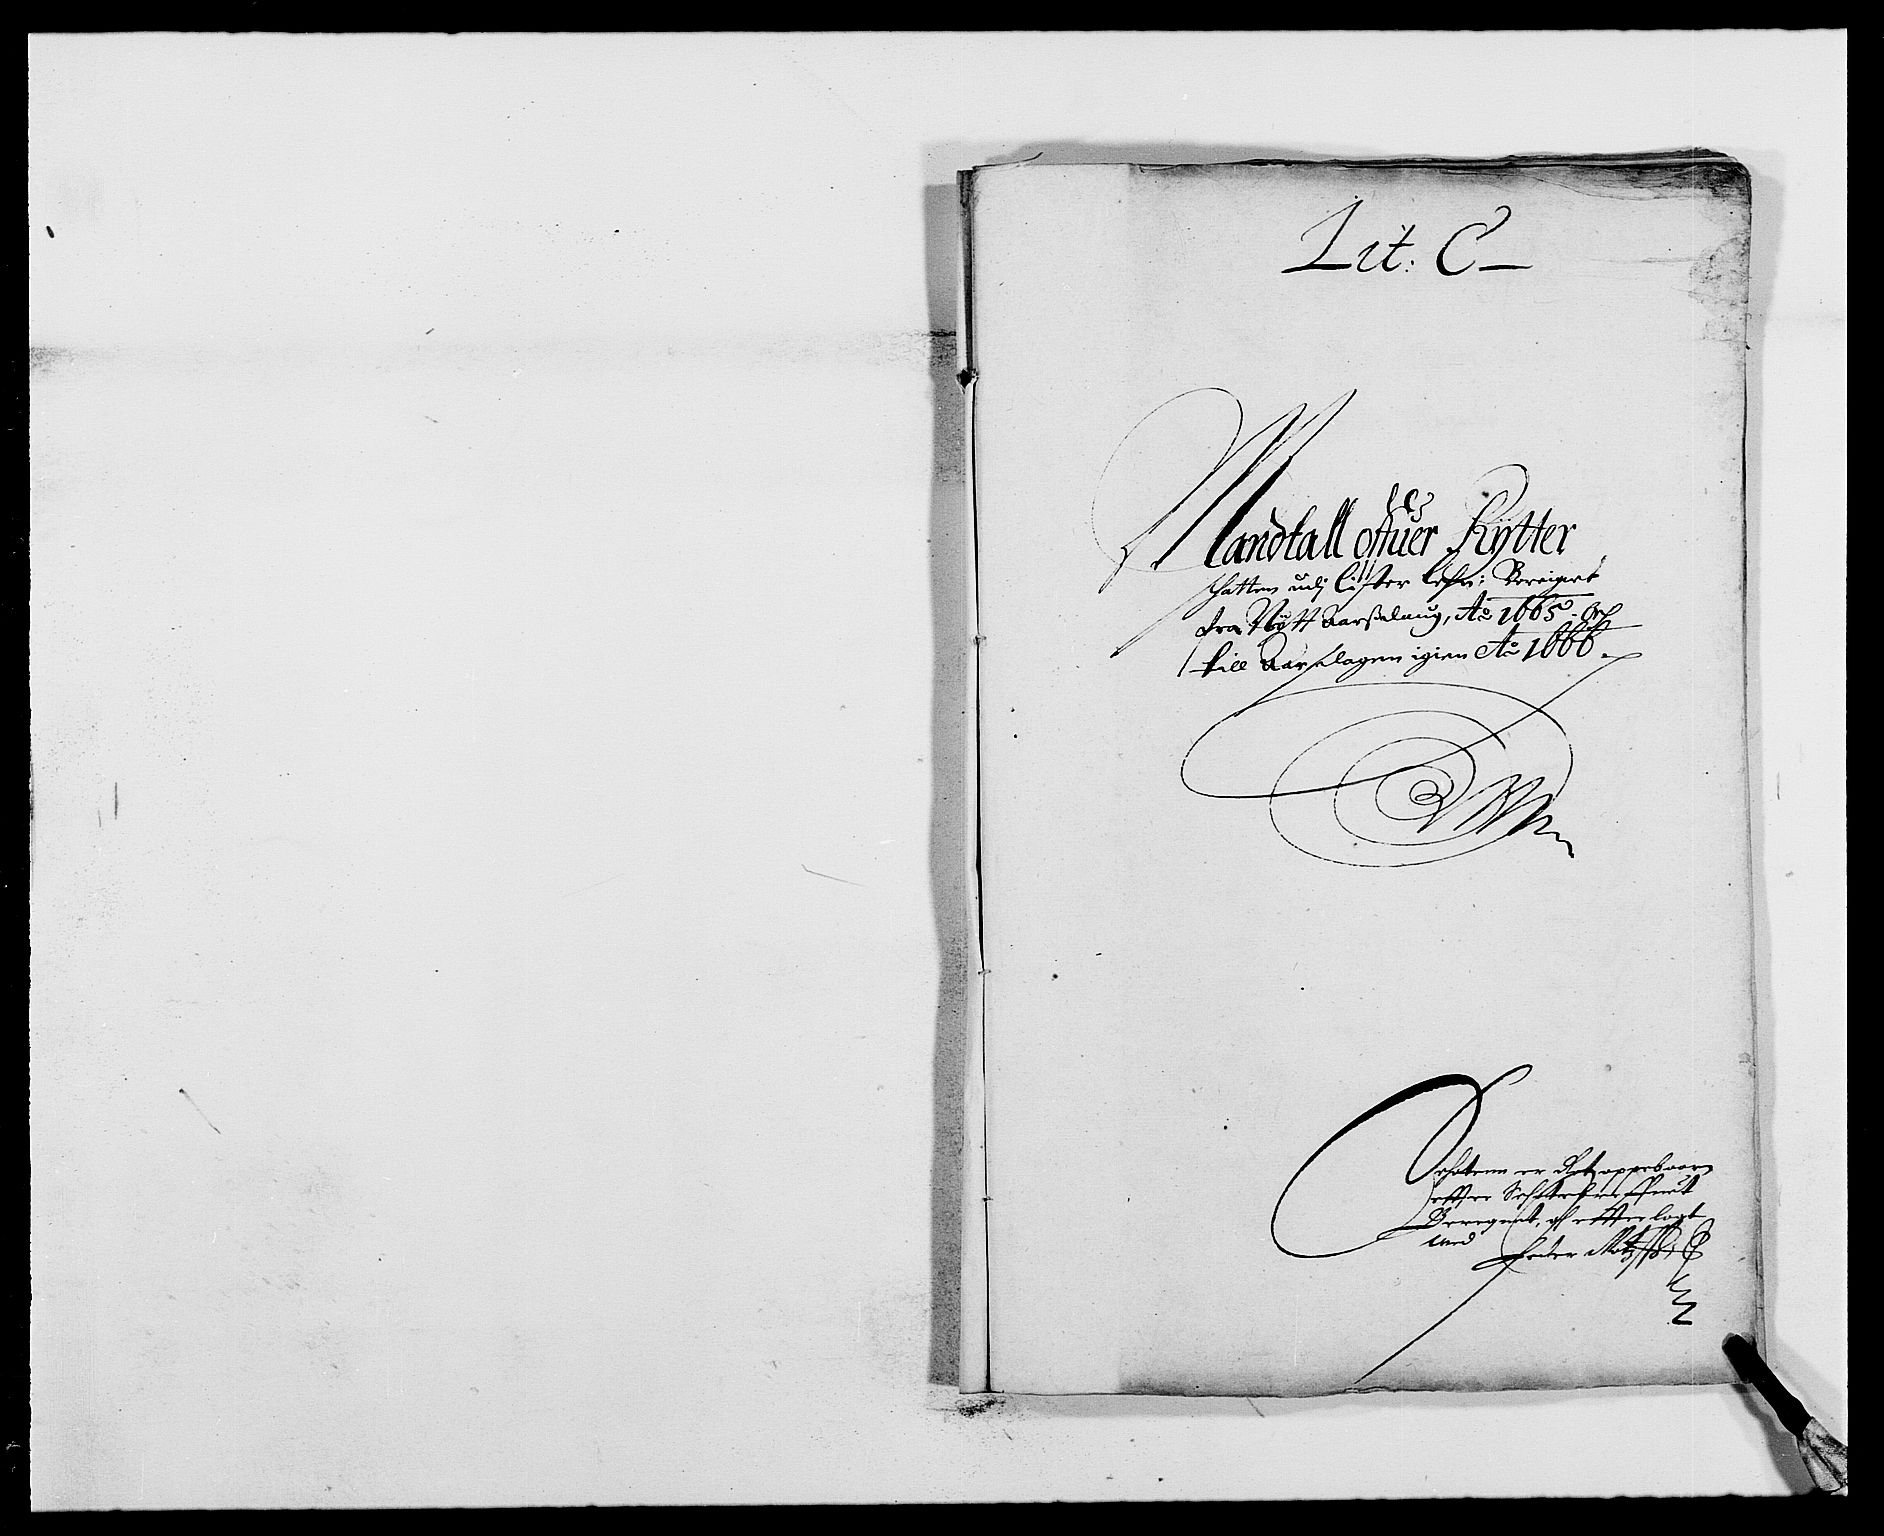 RA, Rentekammeret inntil 1814, Reviderte regnskaper, Fogderegnskap, R41/L2524: Fogderegnskap Lista, 1665-1668, s. 48